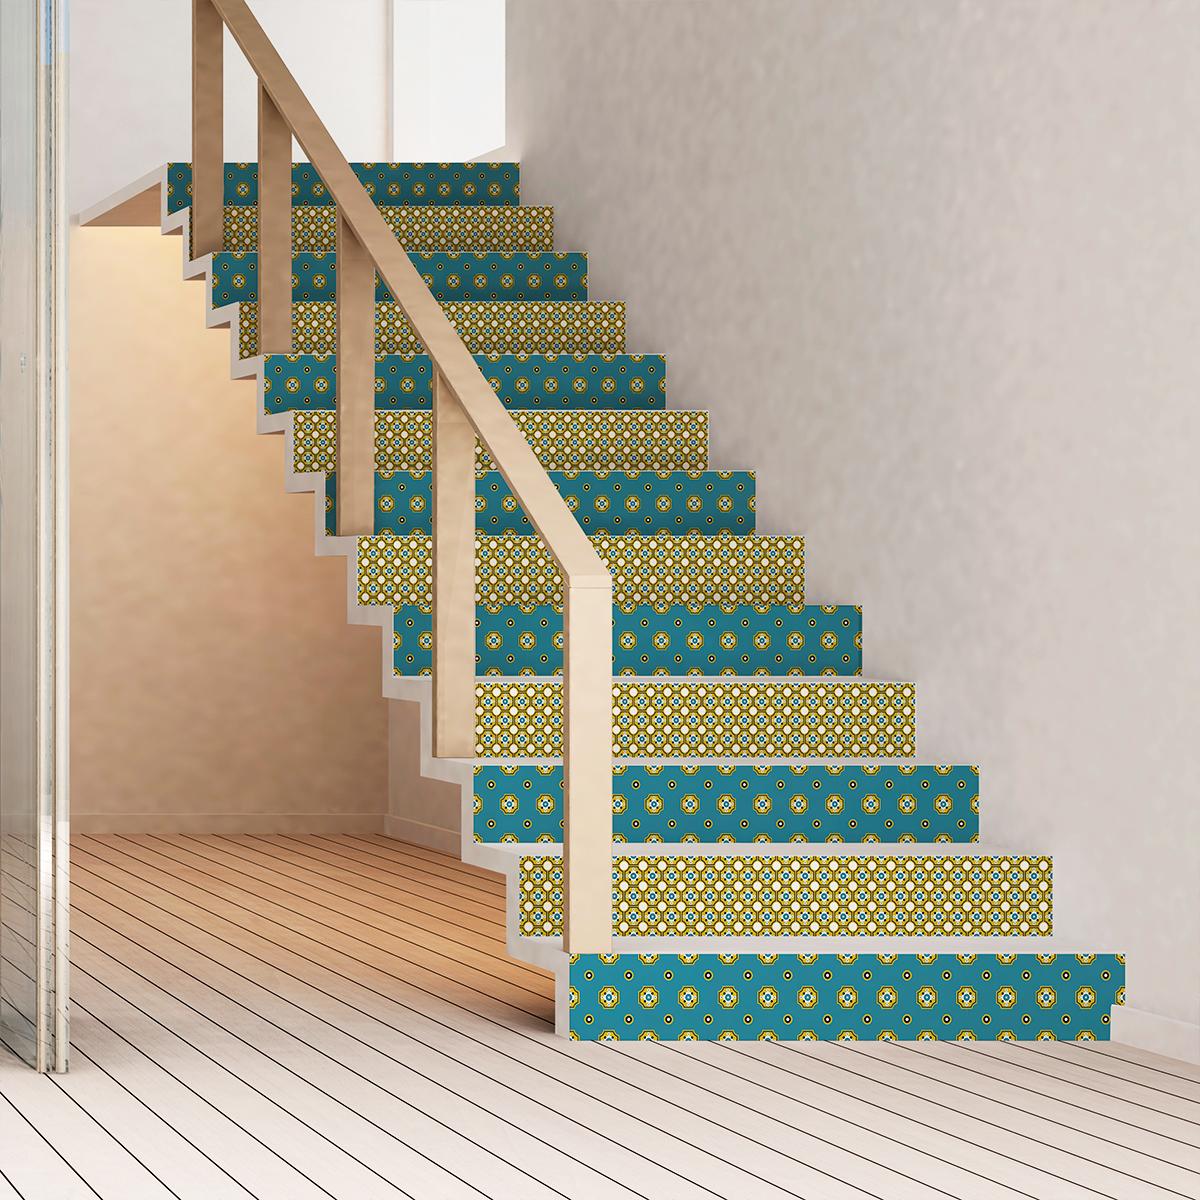 Stickers escalier carreaux de ciment oglavee x 2 ambiance sticker col stairs ros b076 stickers - Escalier carreaux de ciment ...